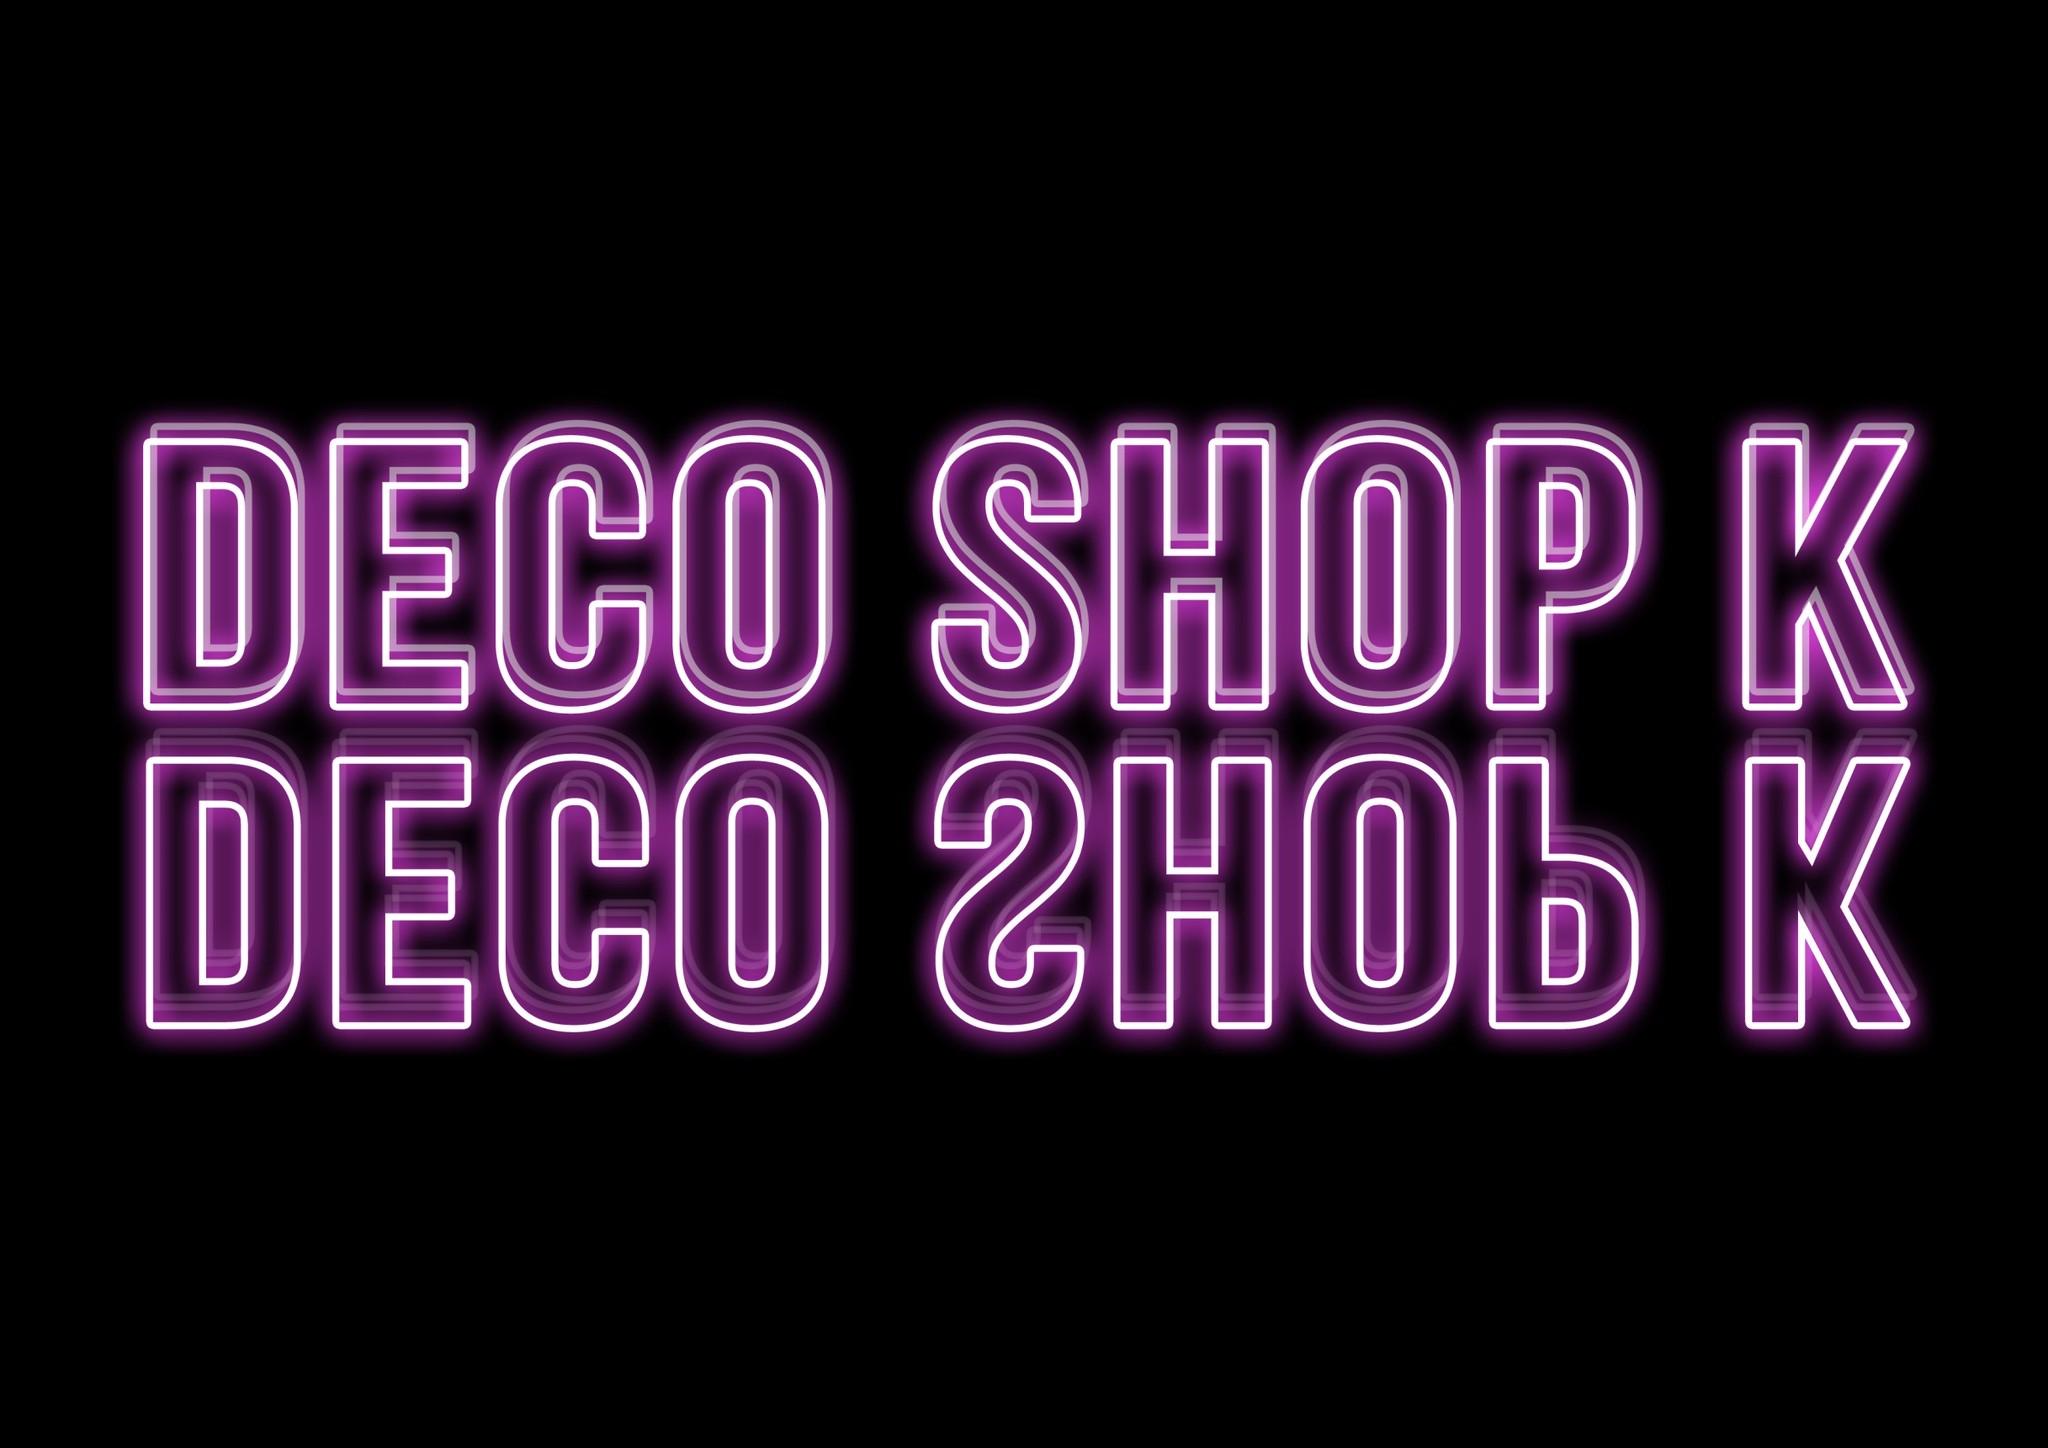 DECO SHOP K